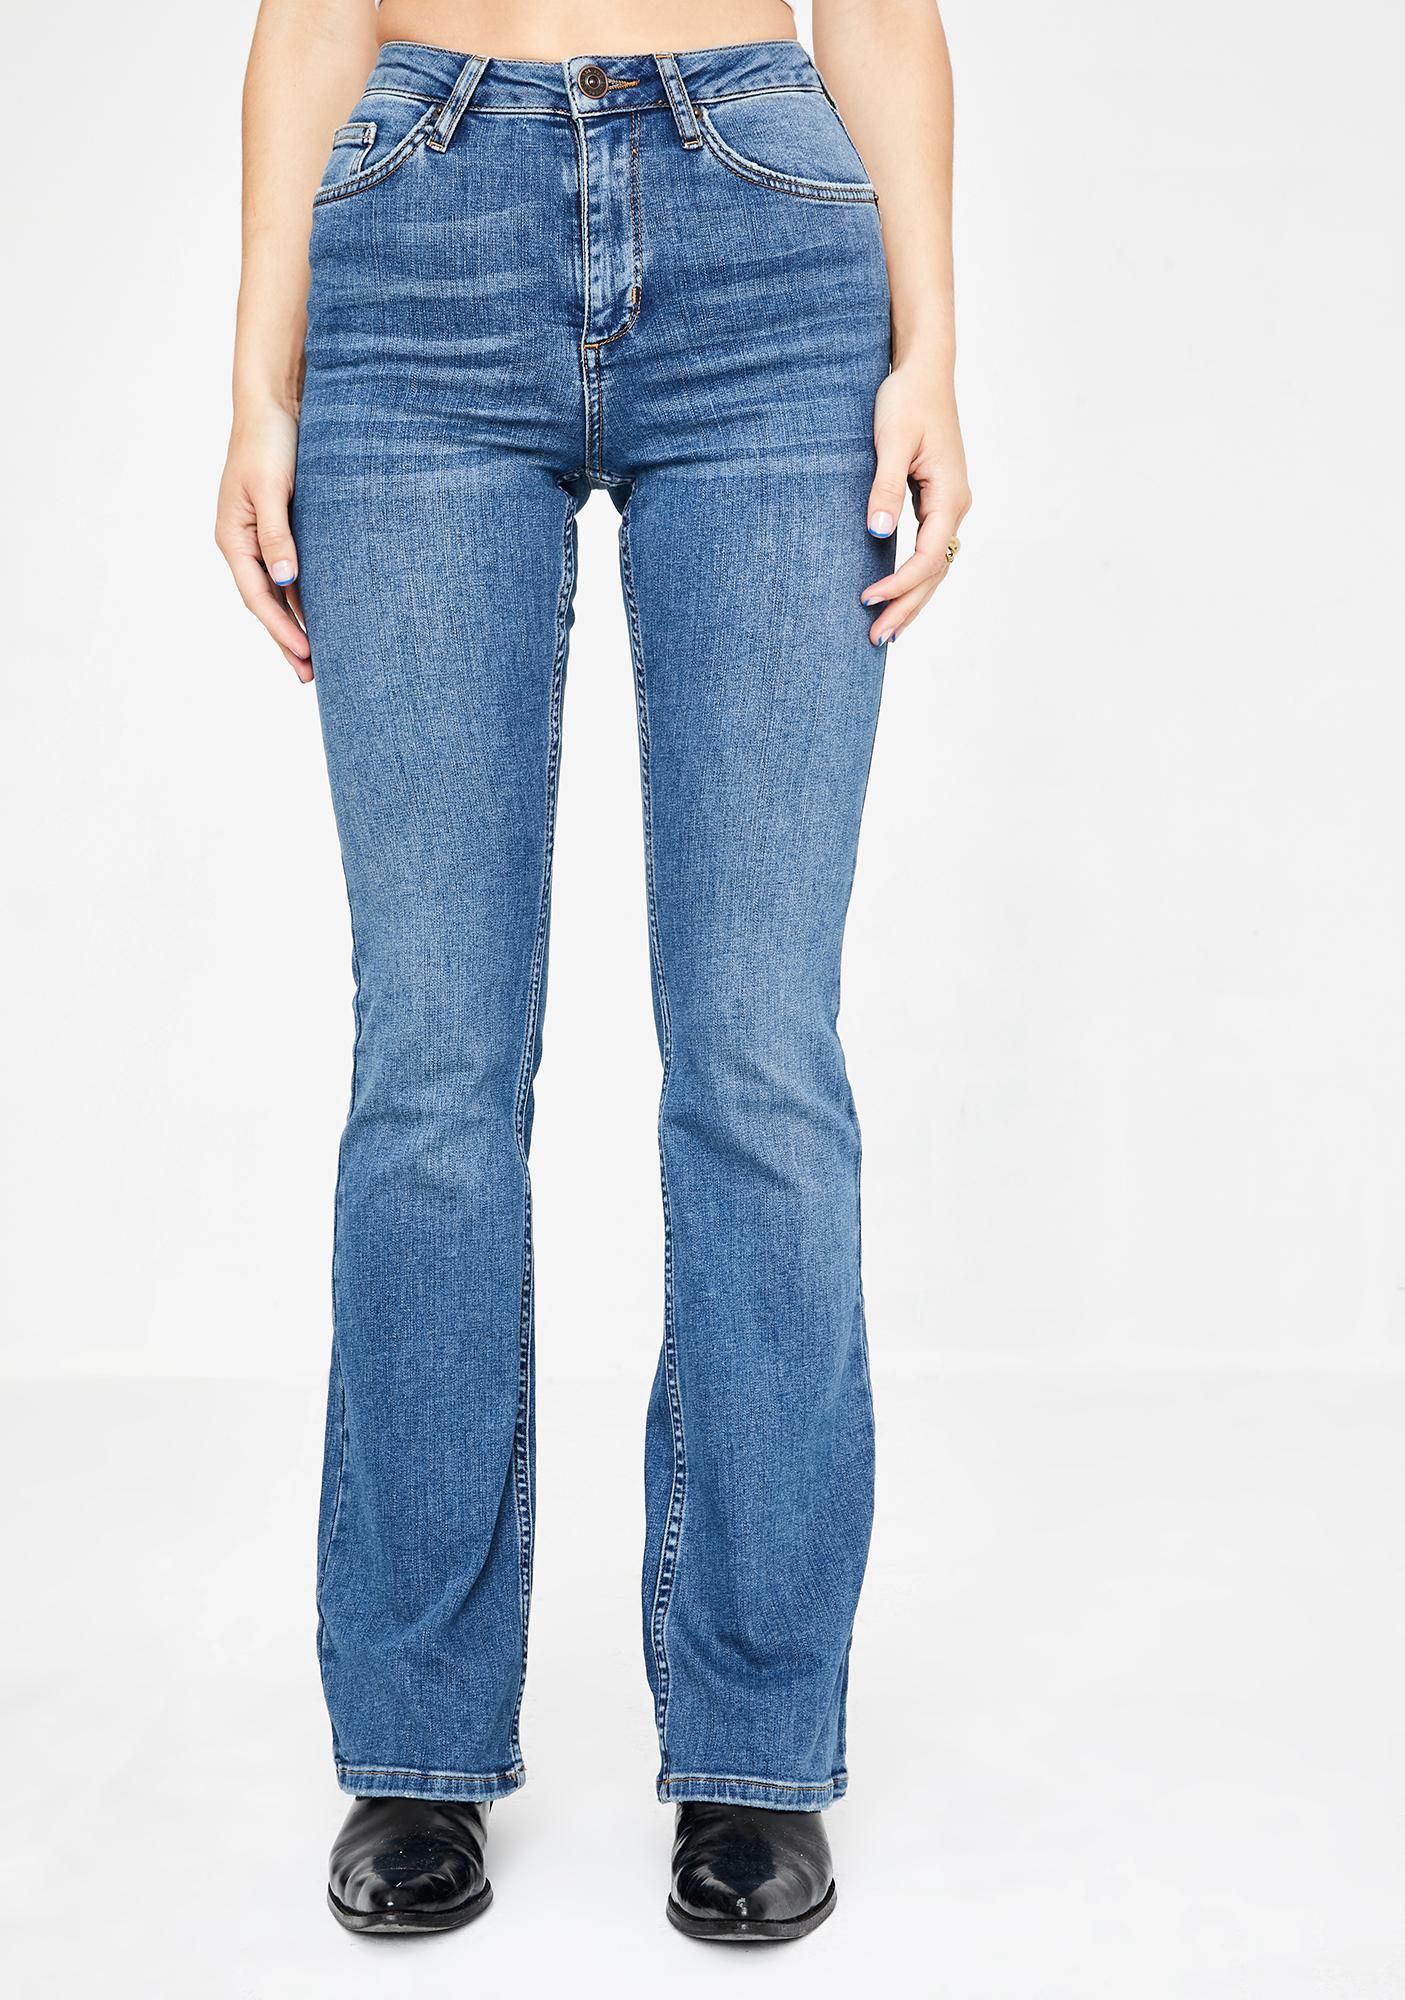 BDG High Rise Vintage Flare Jeans